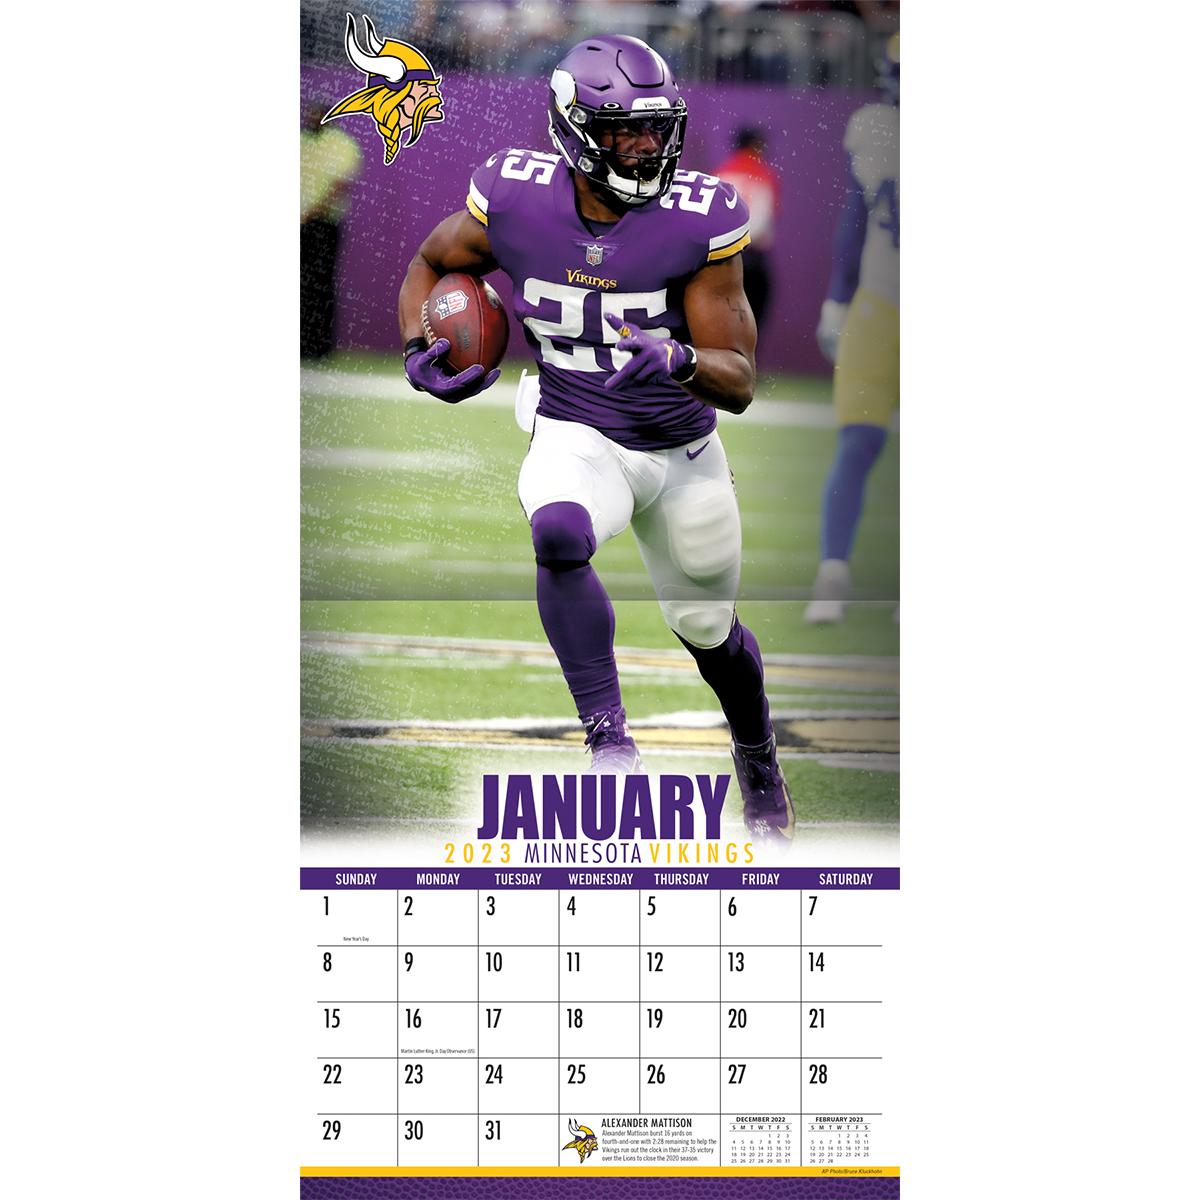 Minnesota Vikings 2019 NFL Mini Wall Calendar - Buy at KHC ...